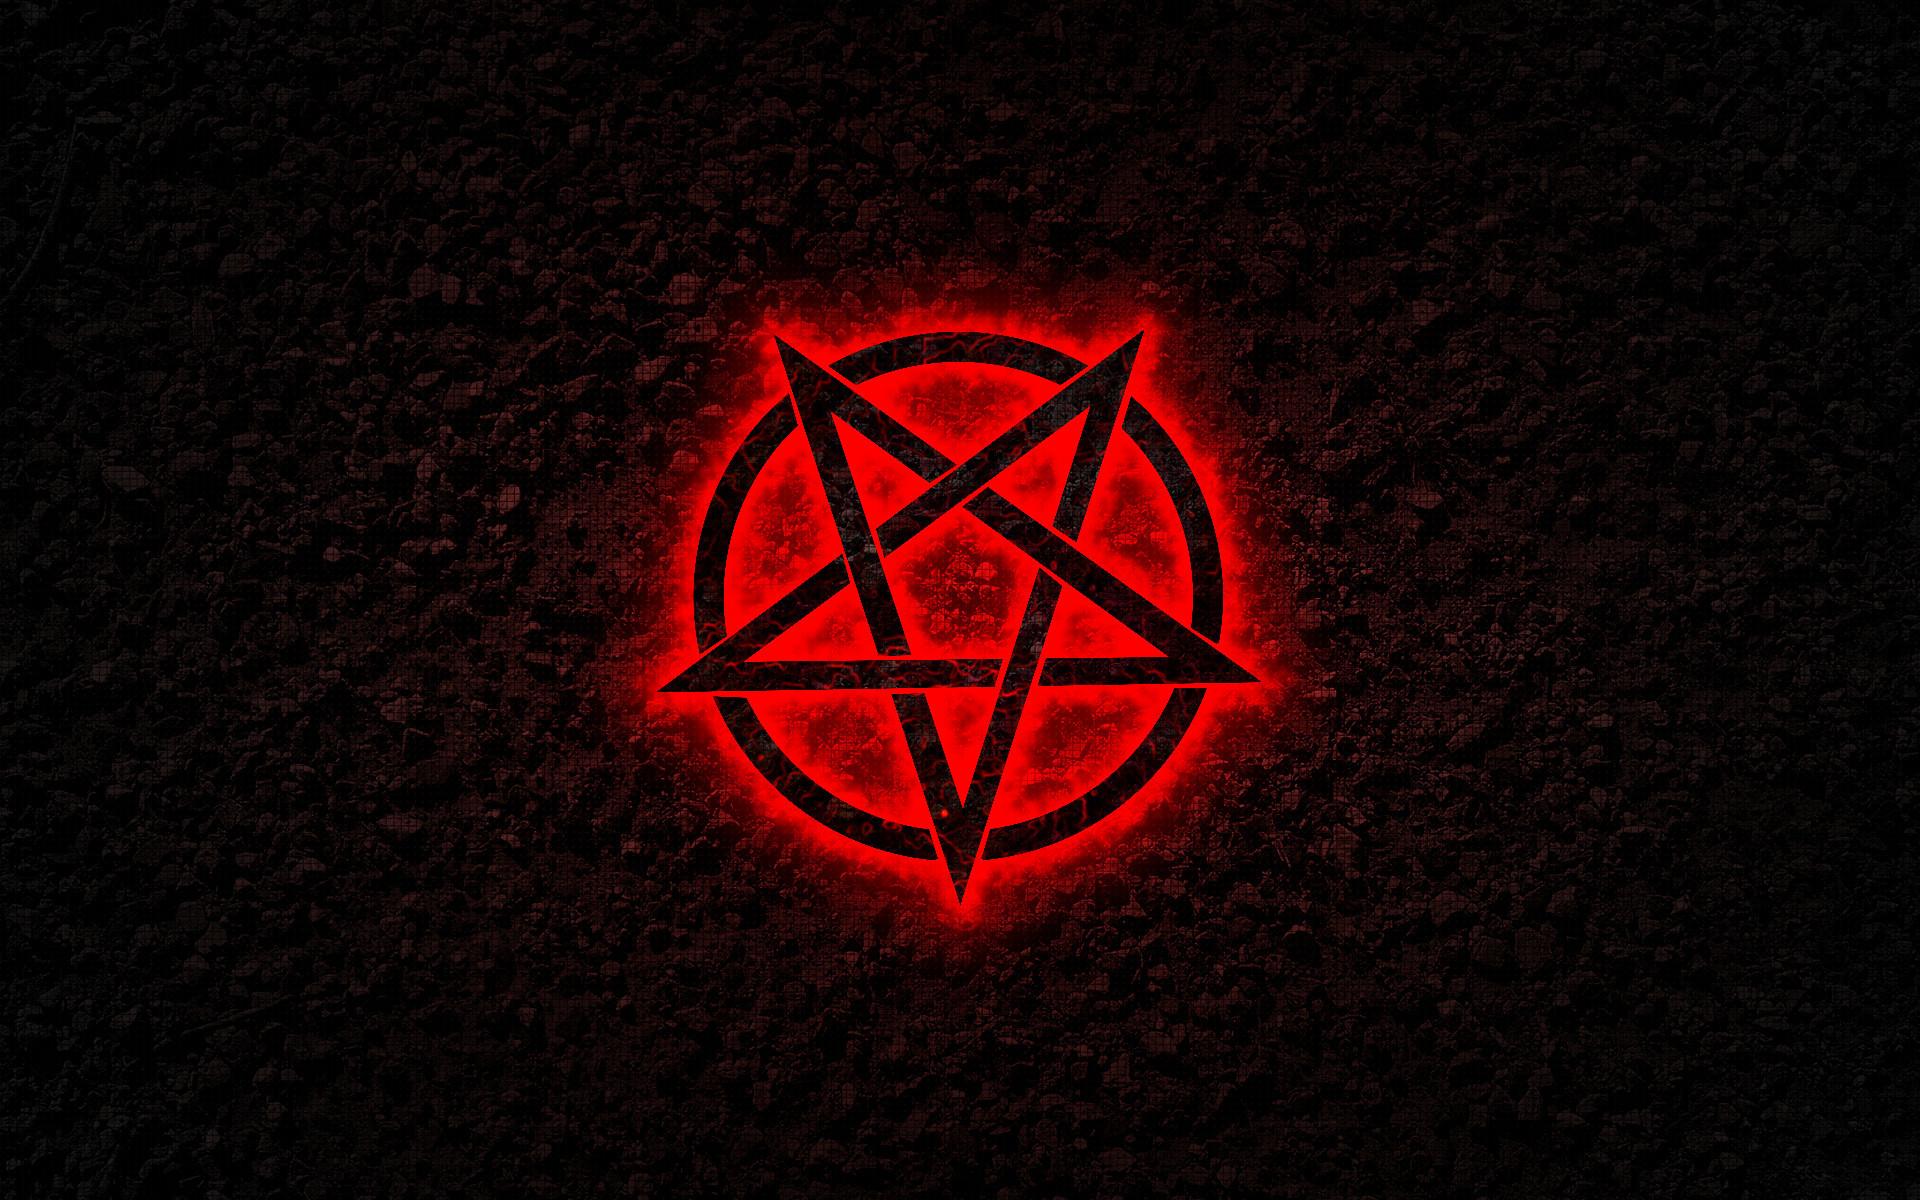 Satanic Iphone Wallpaper 65 Images